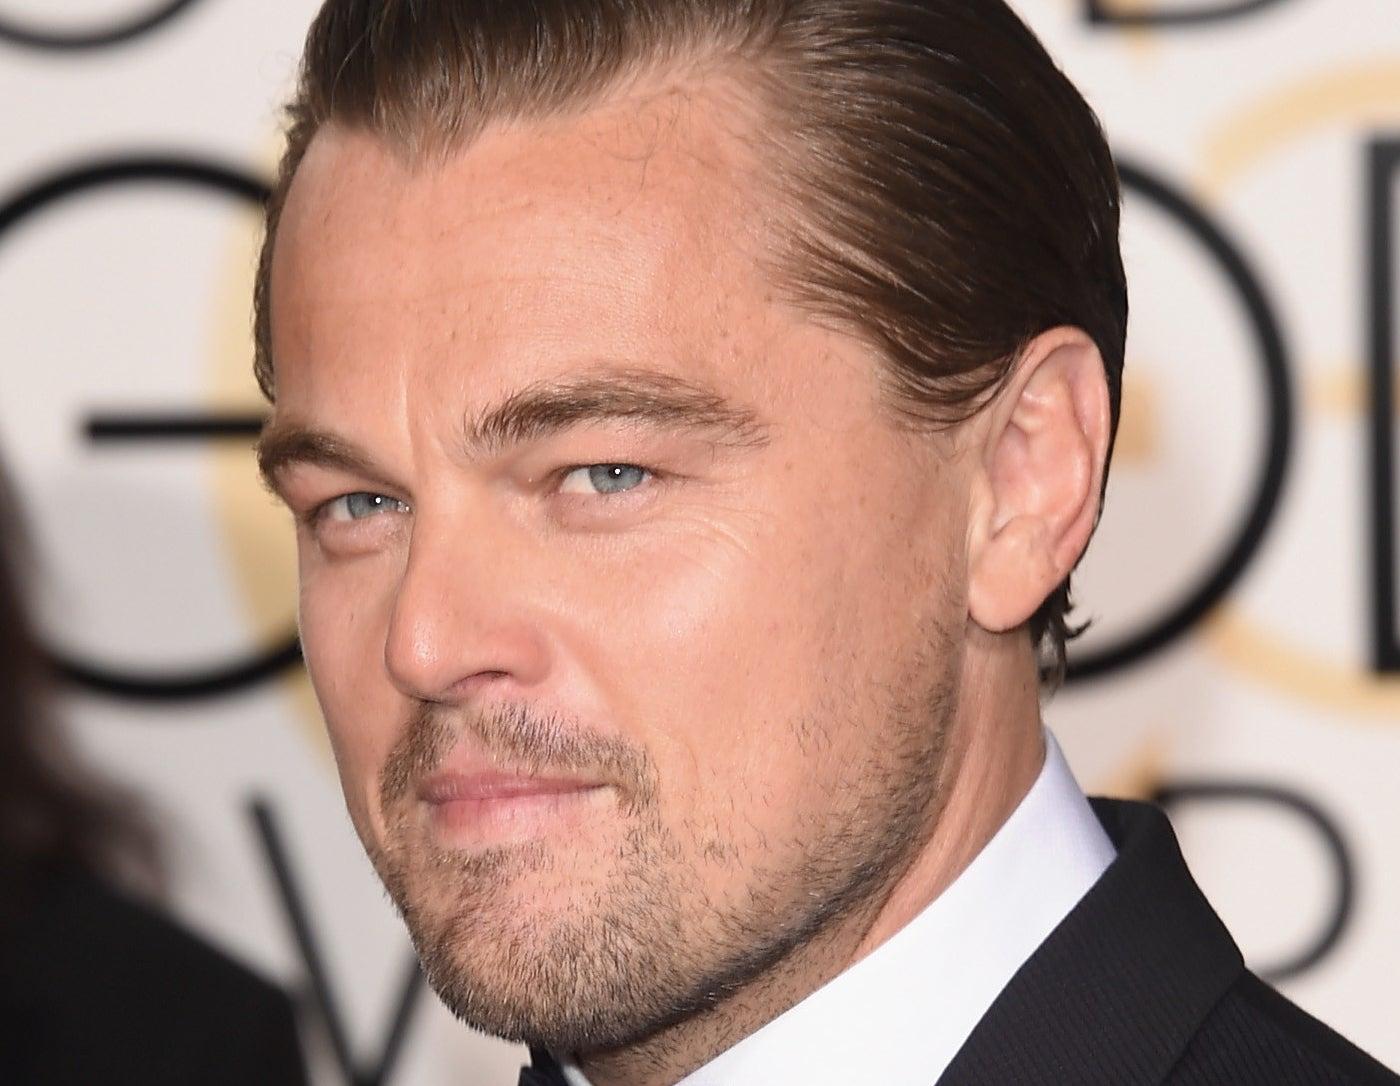 Leonardo DiCaprio at the 2016 Golden Globes.